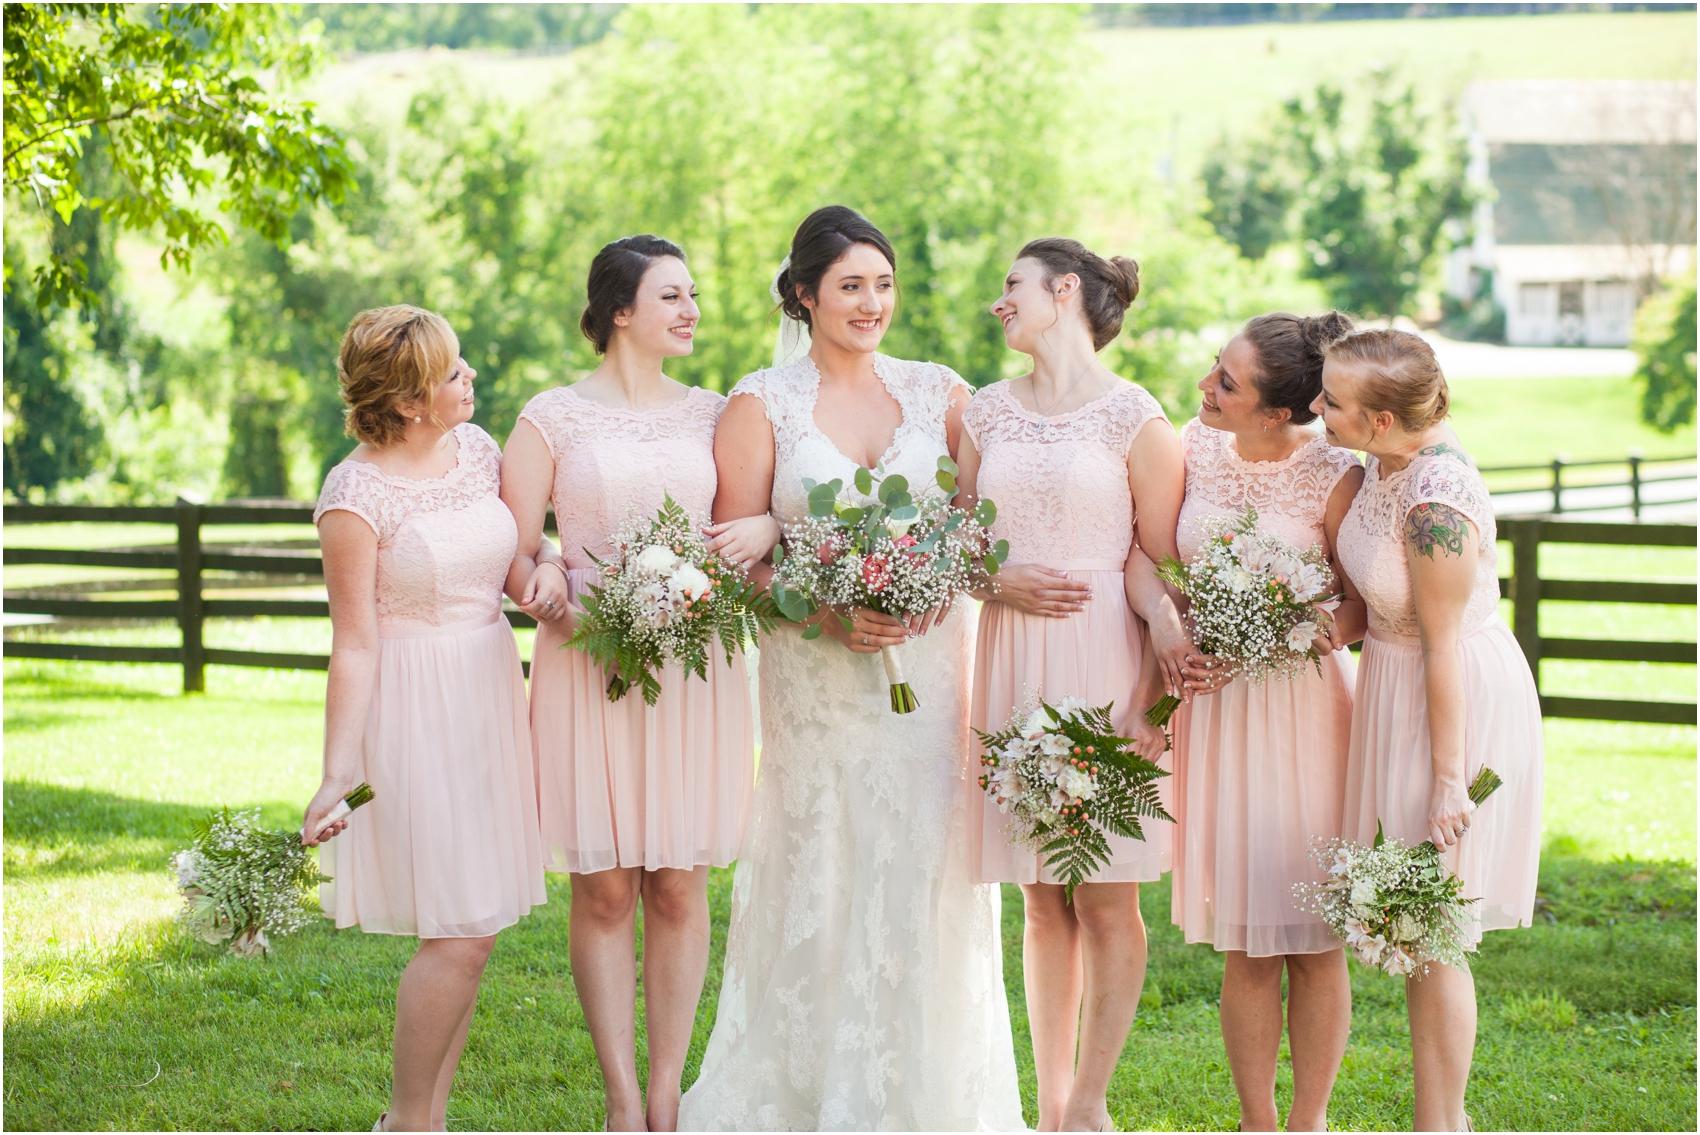 Rodes Farm Charlottesville VA Wedding-2-5.jpg